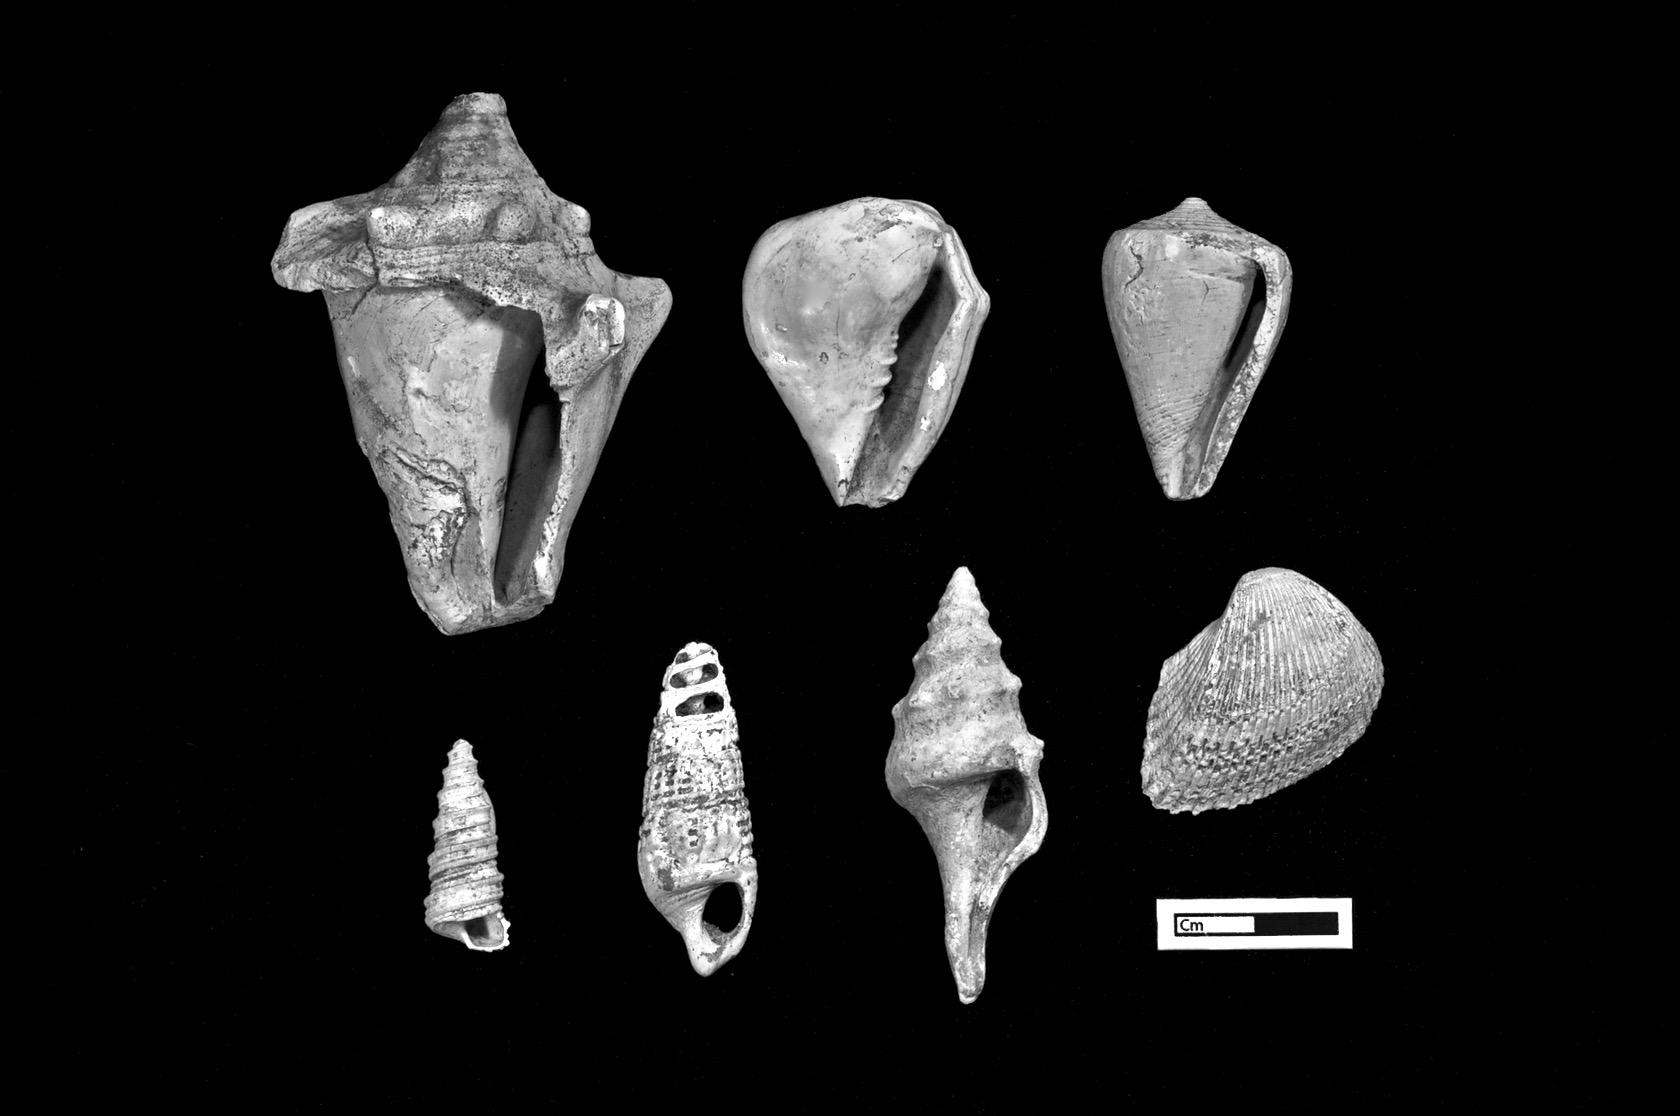 Shells from the Neolithic site Çatalhöyük, Turkey.